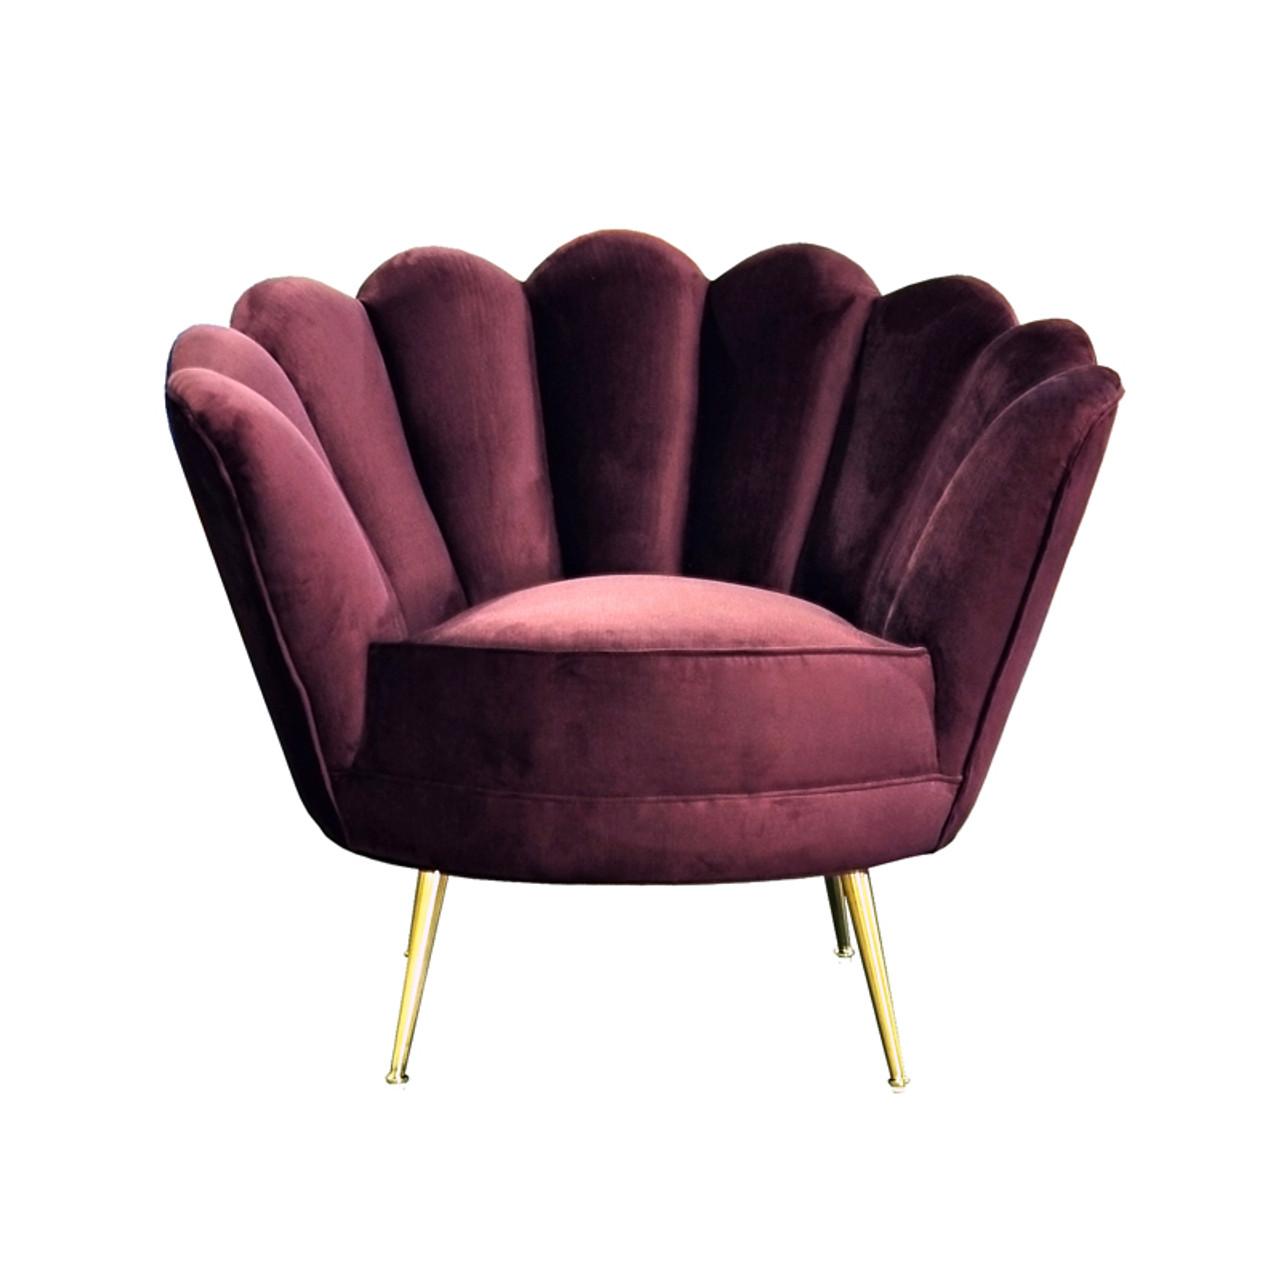 Prime Divani Casa Selva Modern Purple Velvet Accent Chair Machost Co Dining Chair Design Ideas Machostcouk